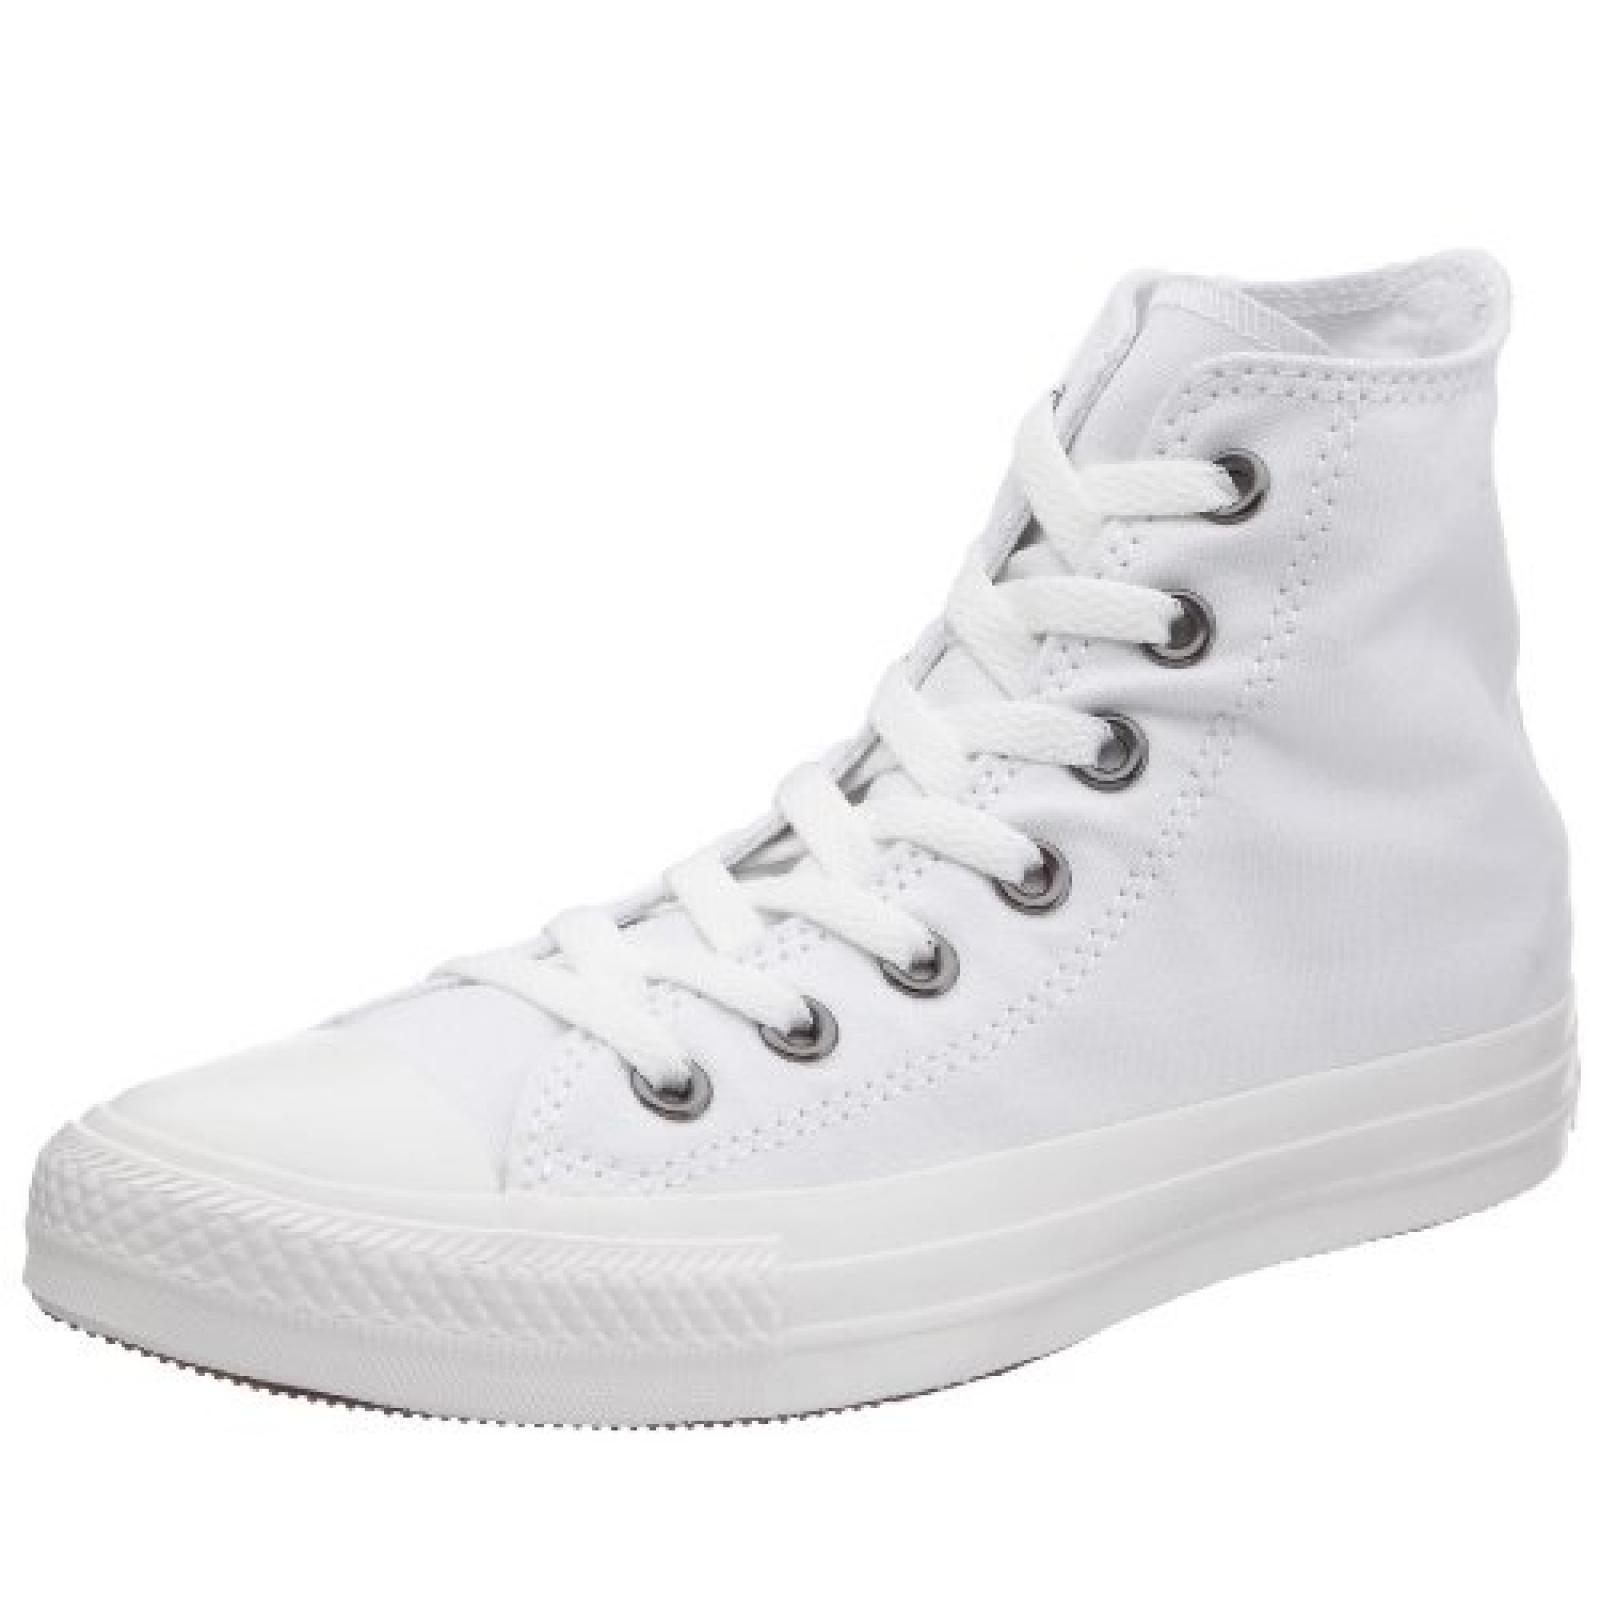 Converse Chuck Taylor All Star Adulte Mono Hi 15470 Unisex - Erwachsene Sneaker